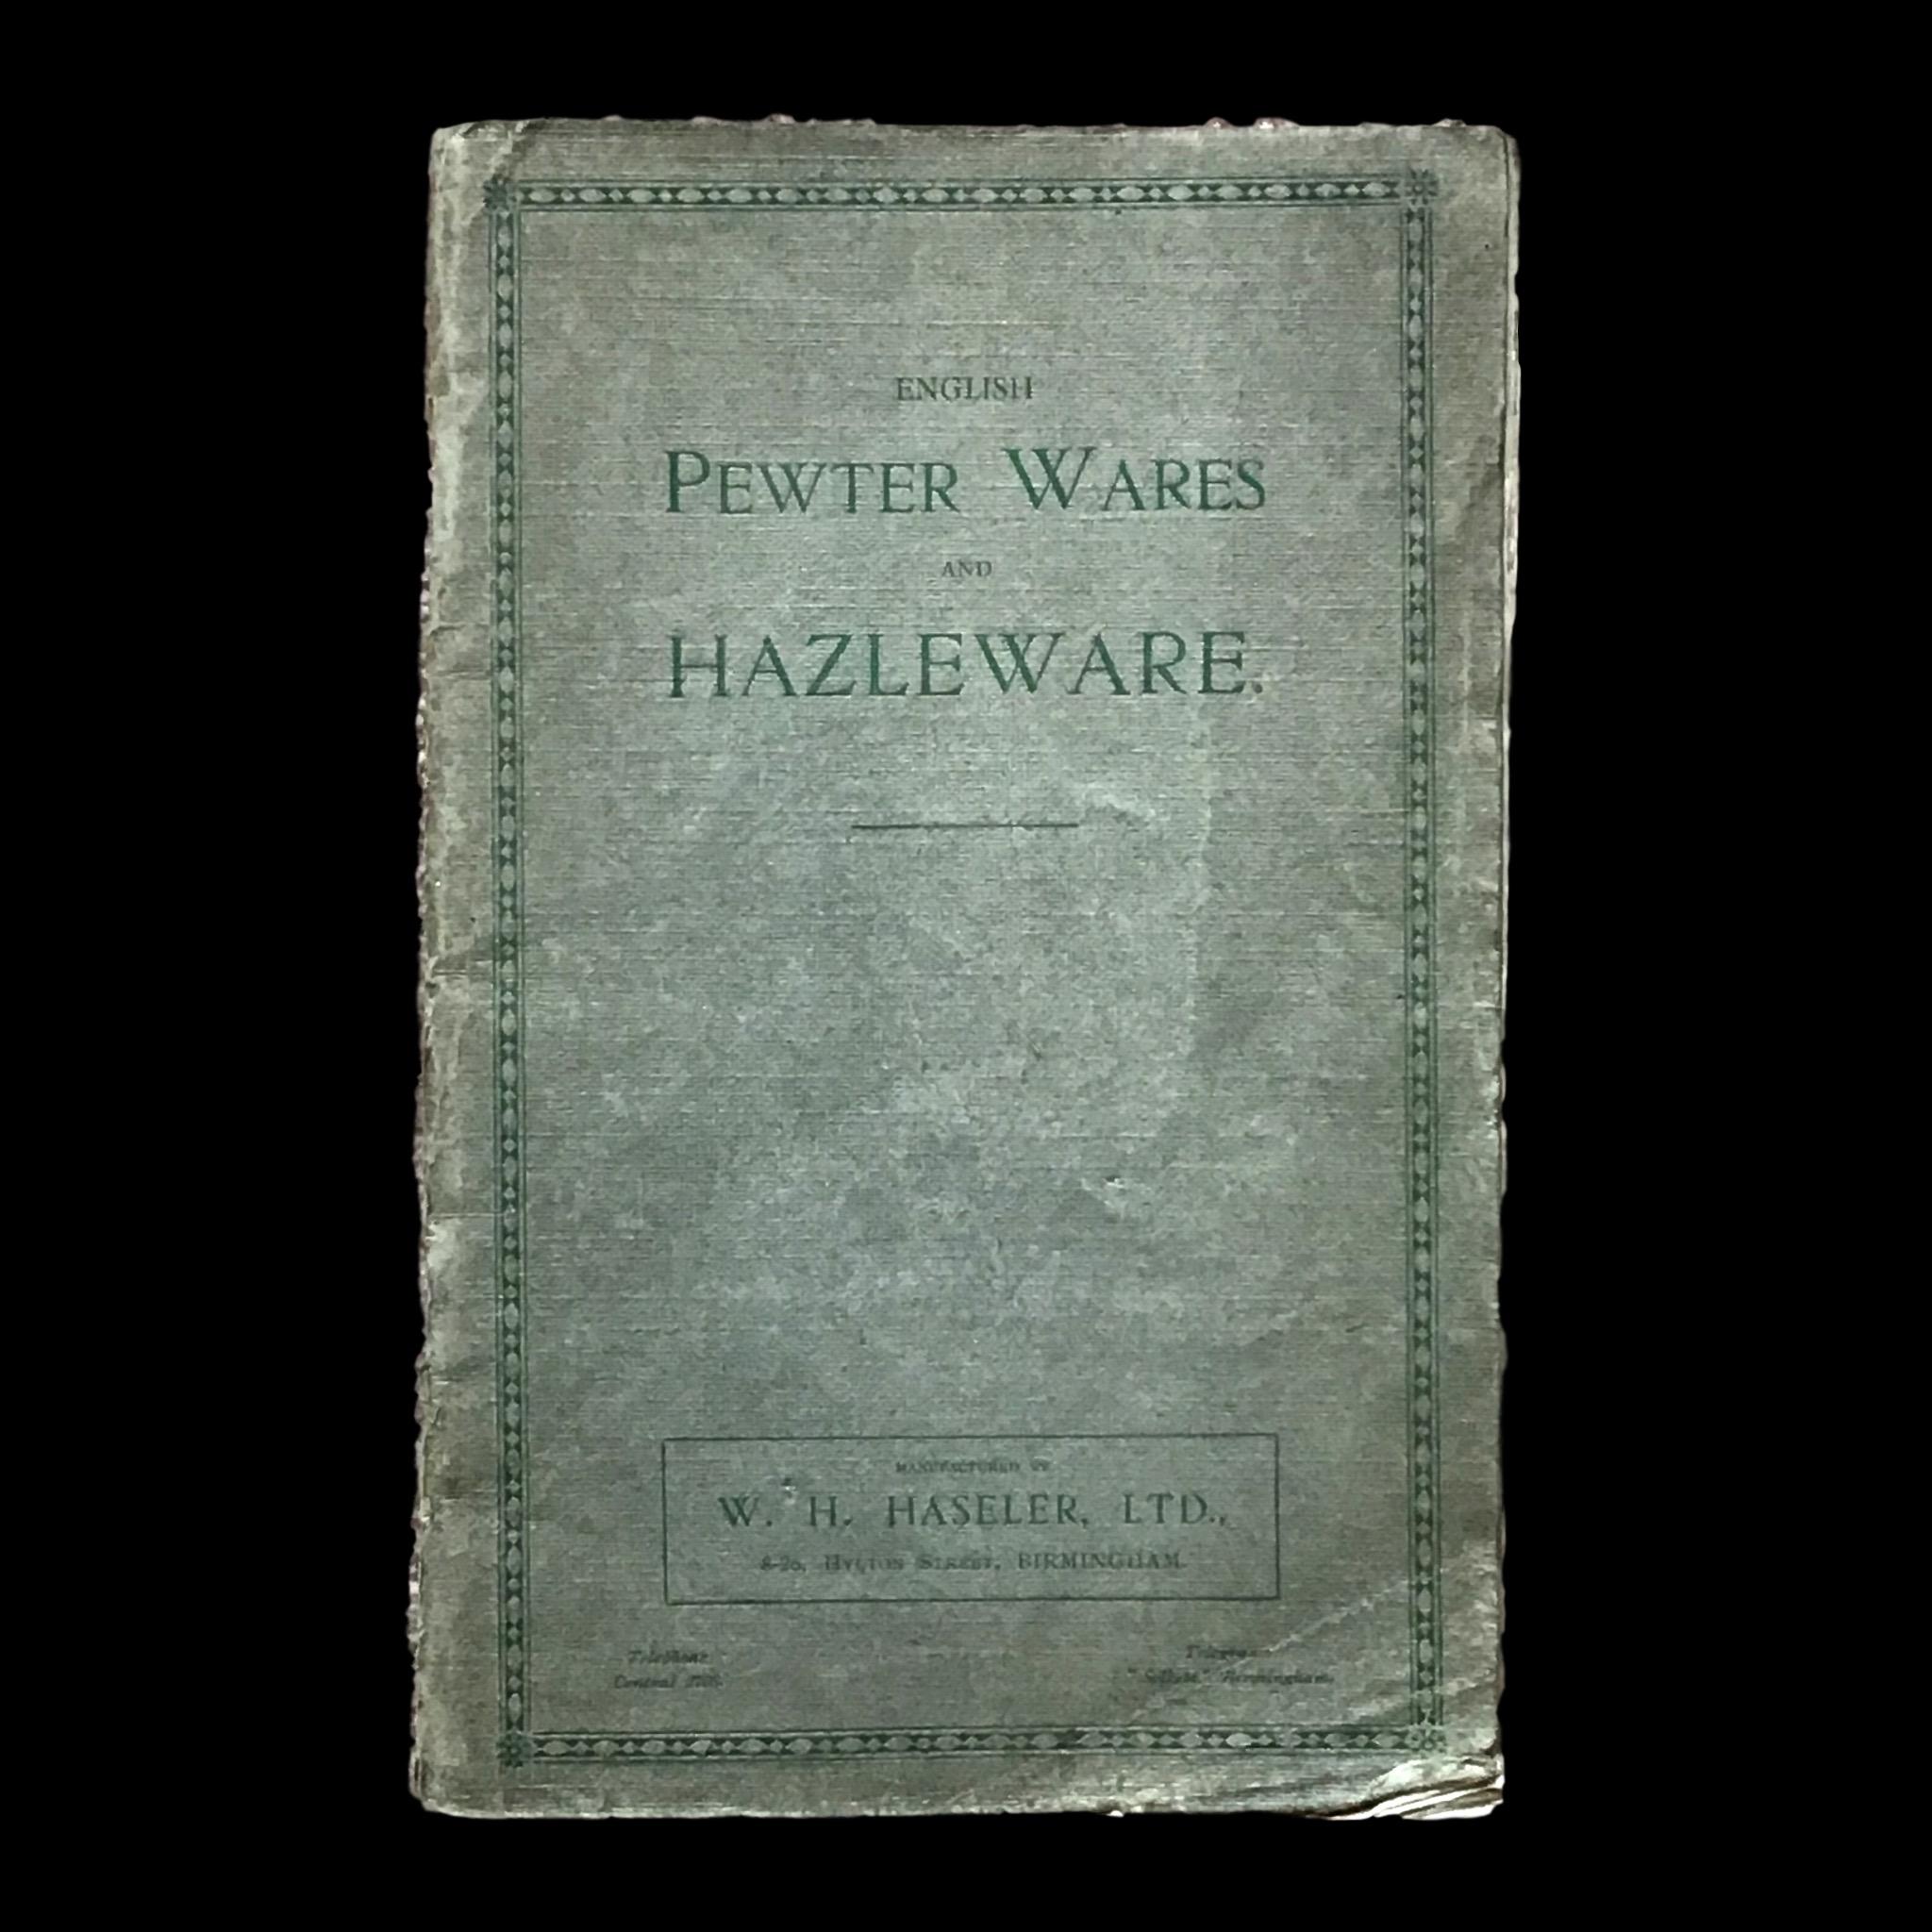 New Haseler/Tudric/Hazleware pewter research